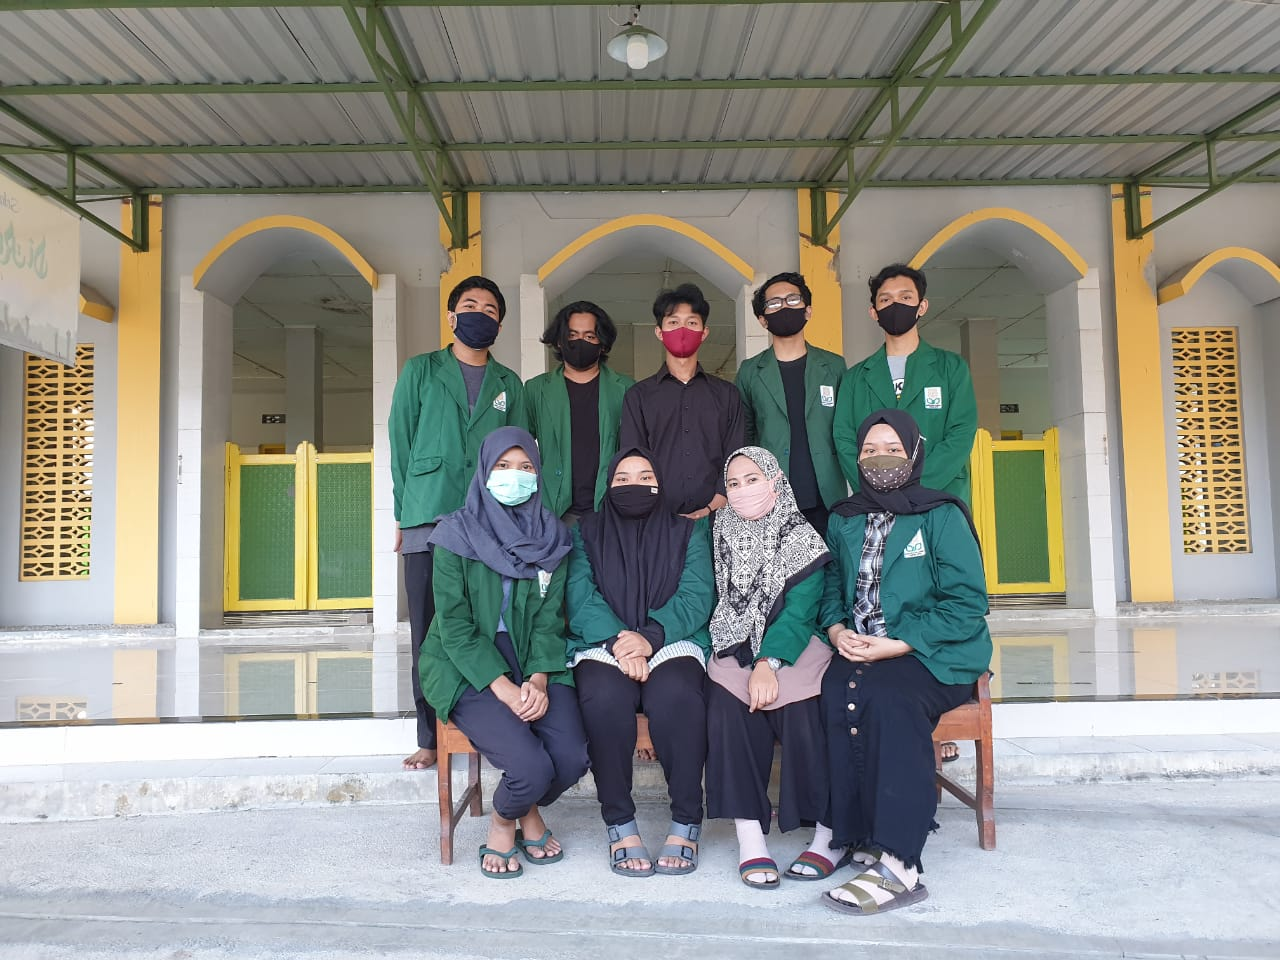 Pemulihan Wisata Pasca Pandemi Covid-19